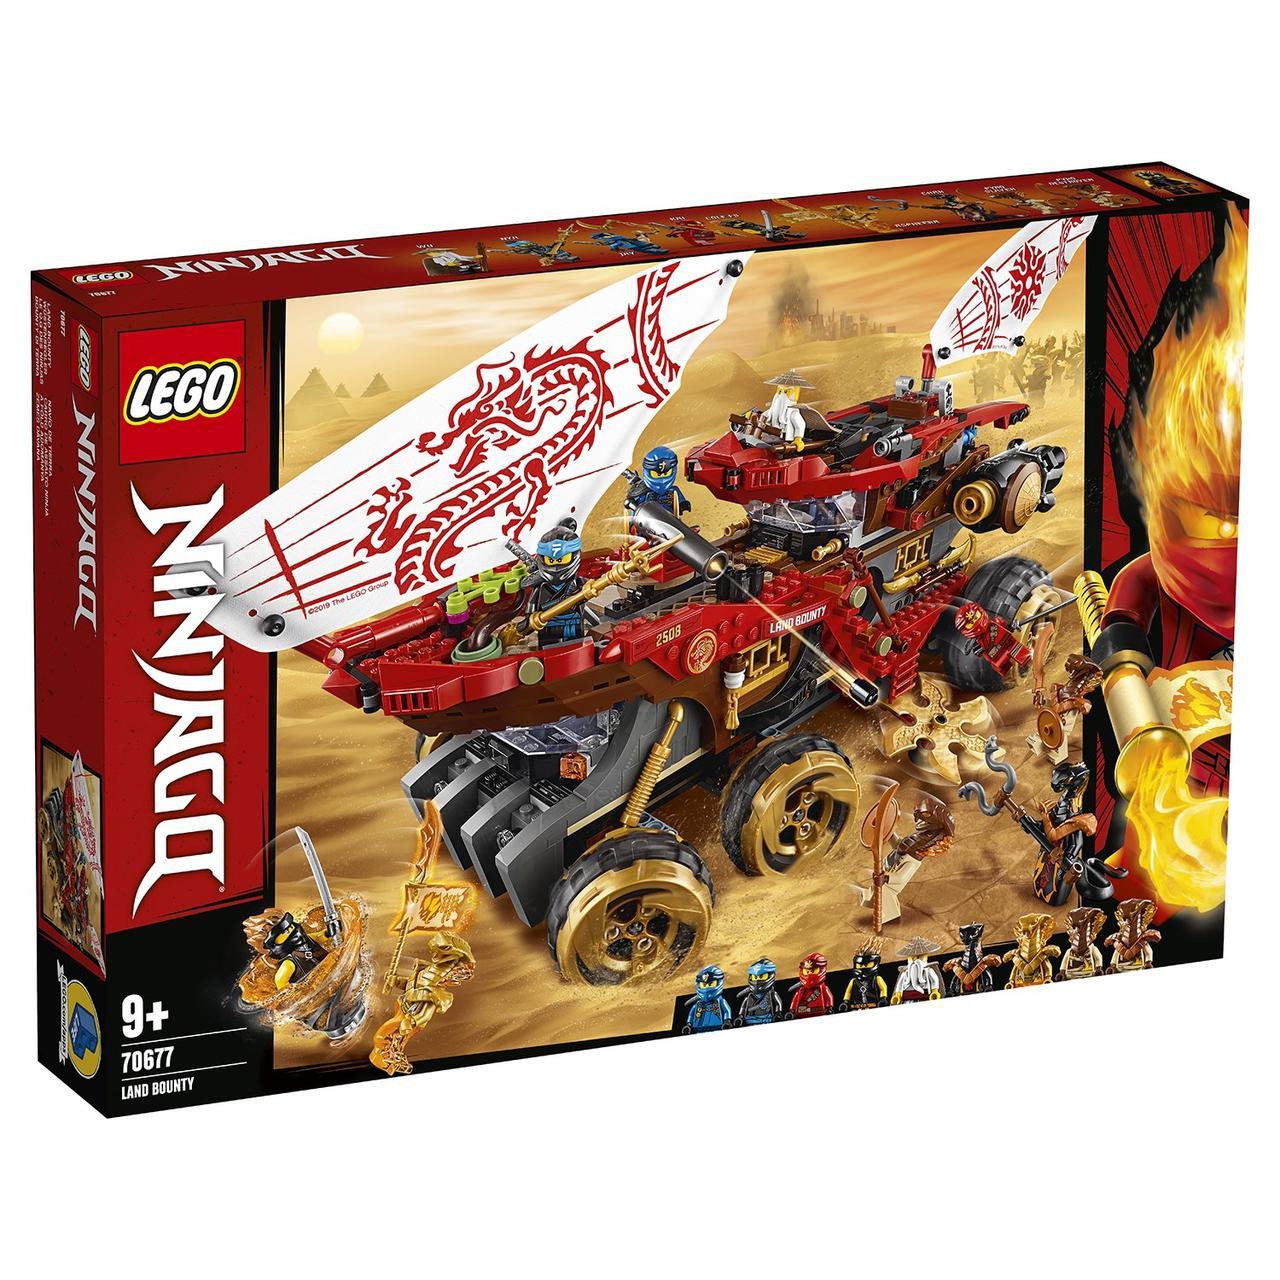 70677 Lego Ninjago Райский уголок, Лего Ниндзяго